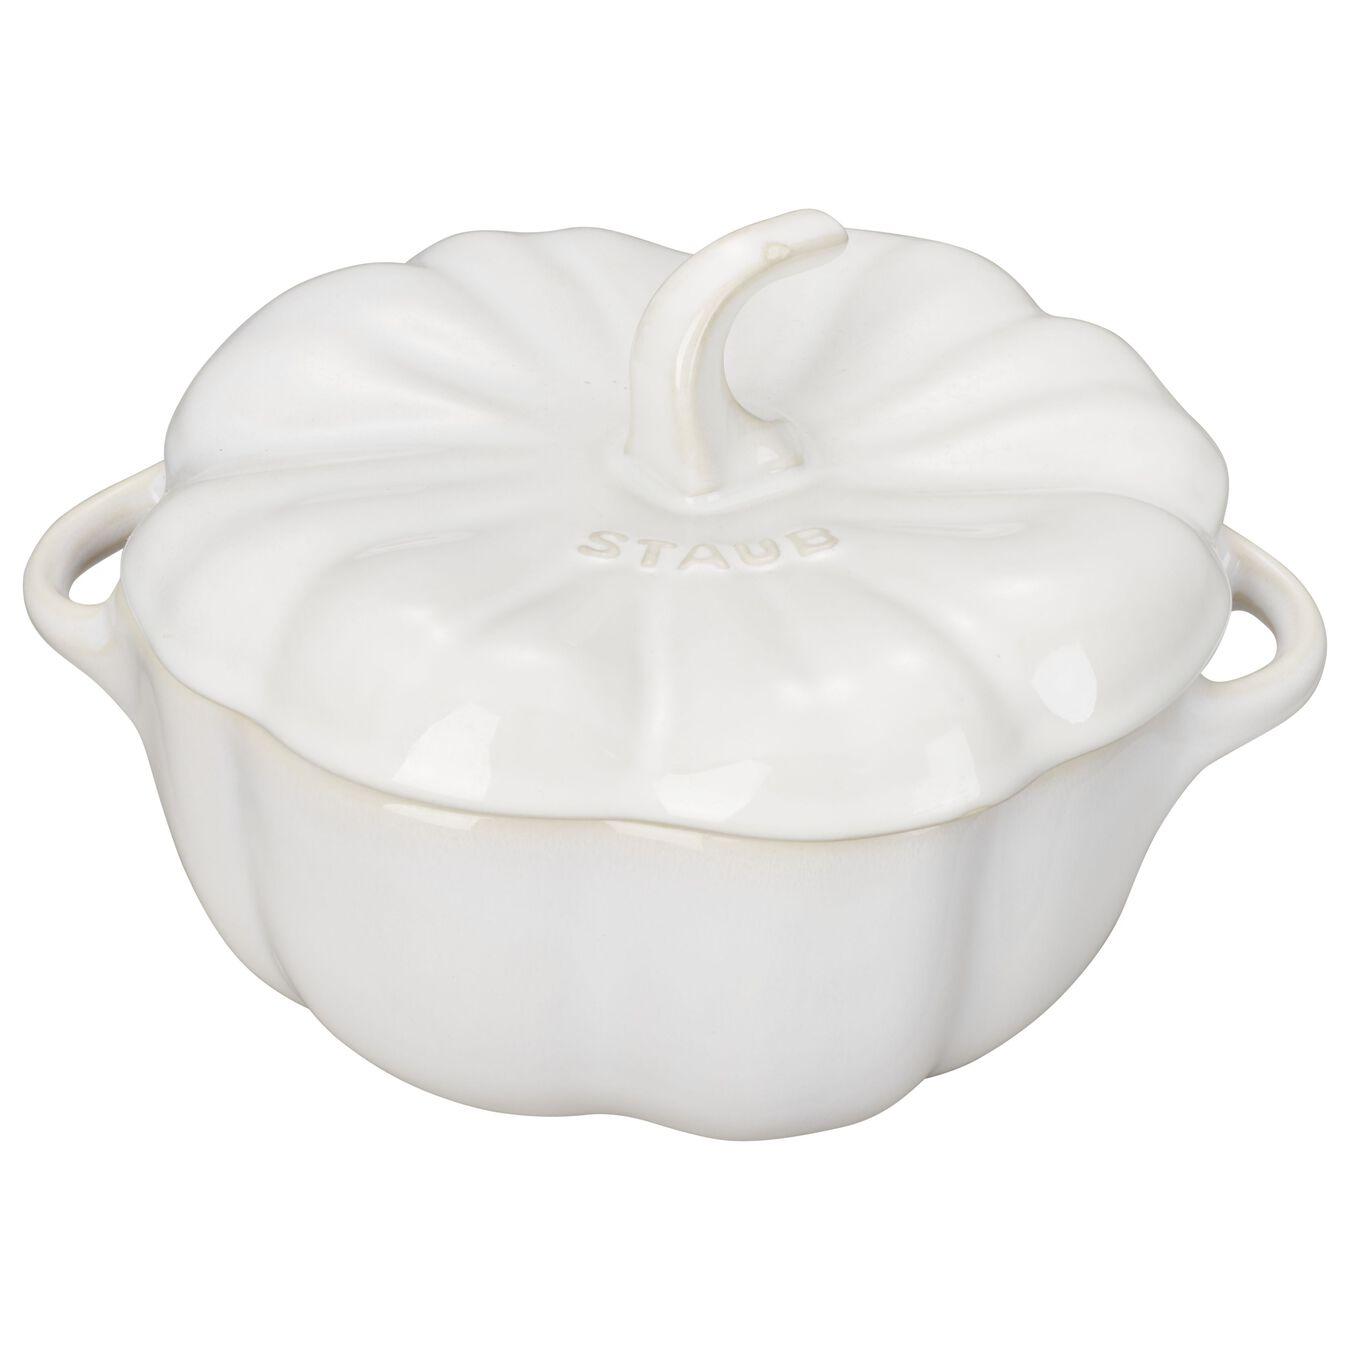 700 ml Ceramic pumpkin Cocotte, ivory-white,,large 1